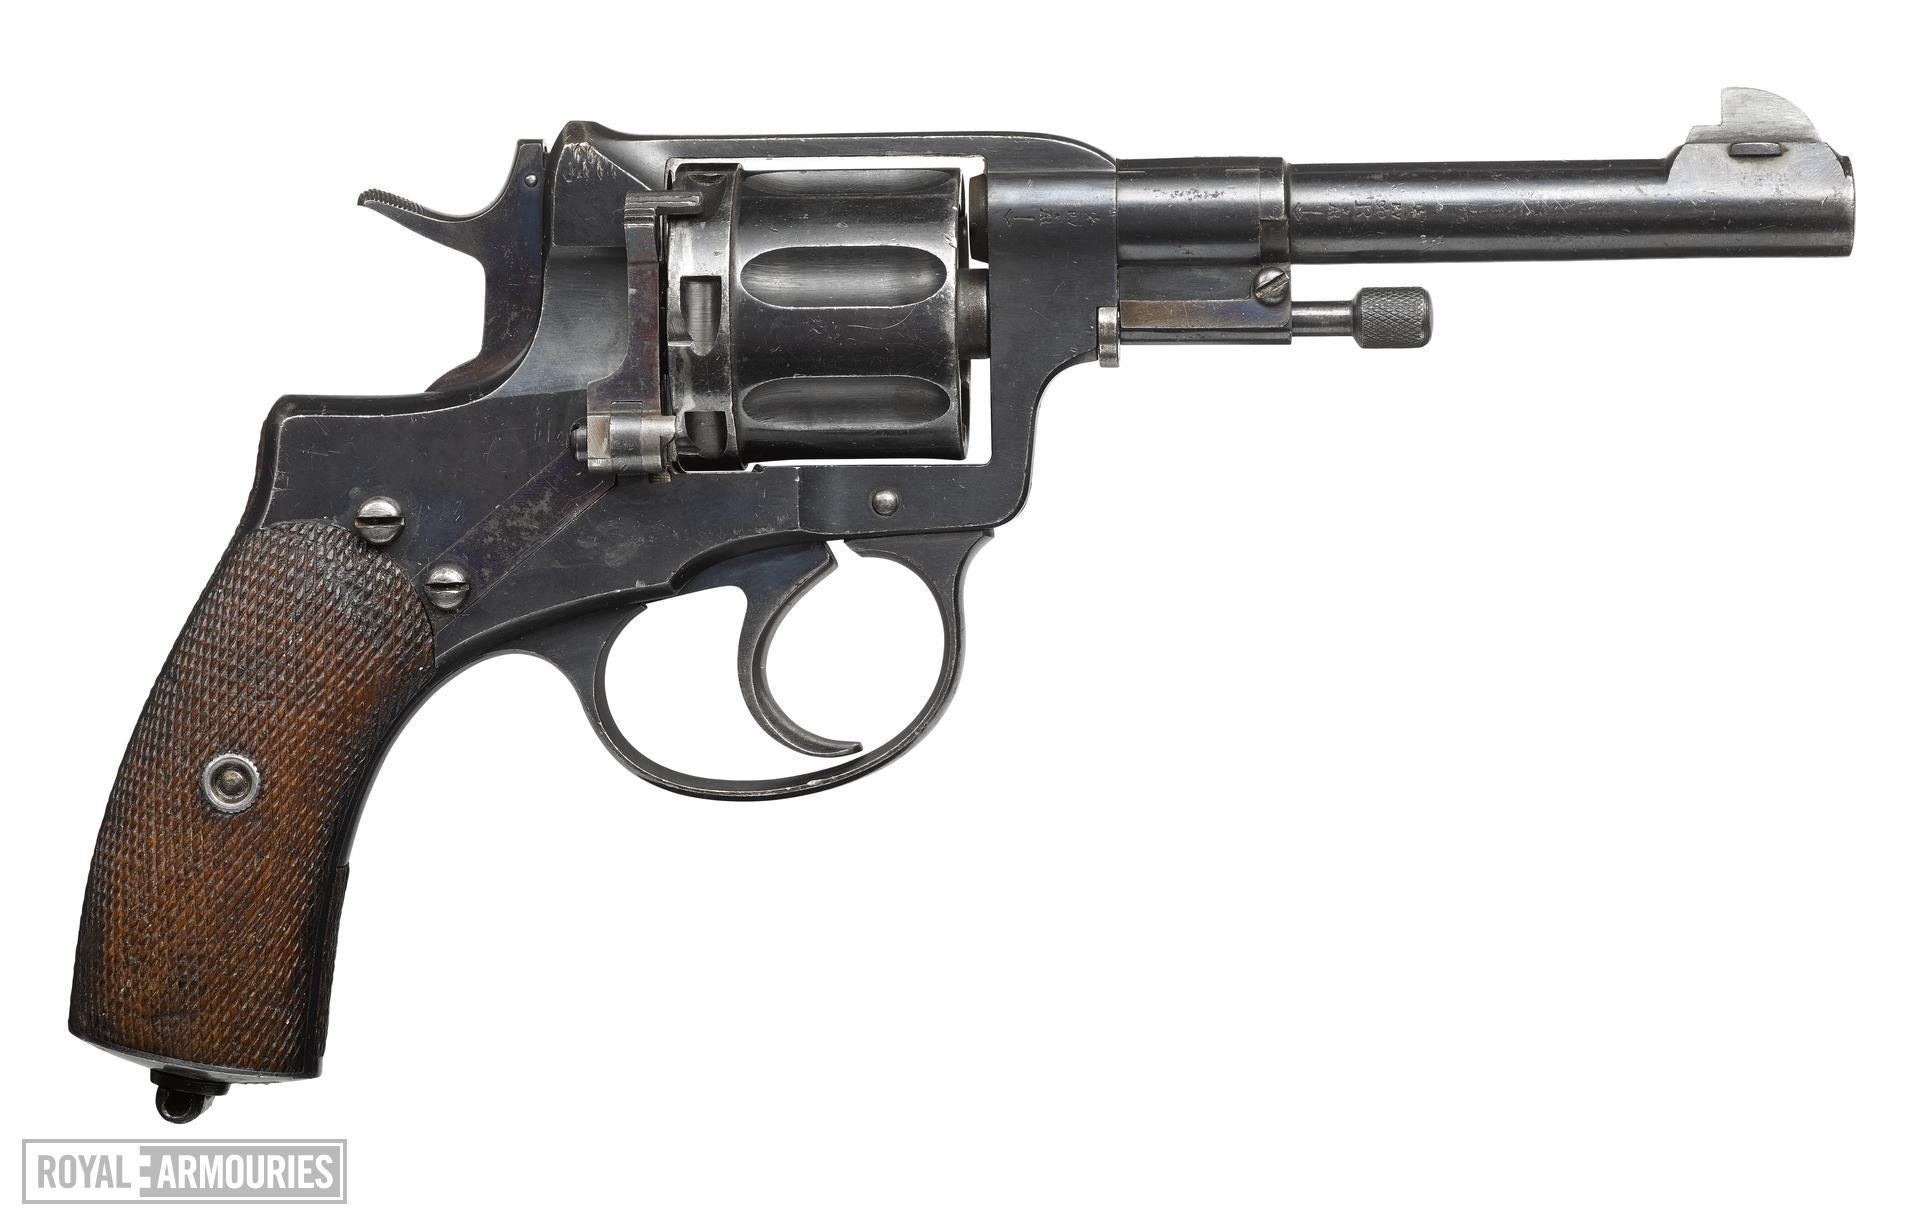 Nagant Model 1895 centrefire six shot revolver, Russia, 1898